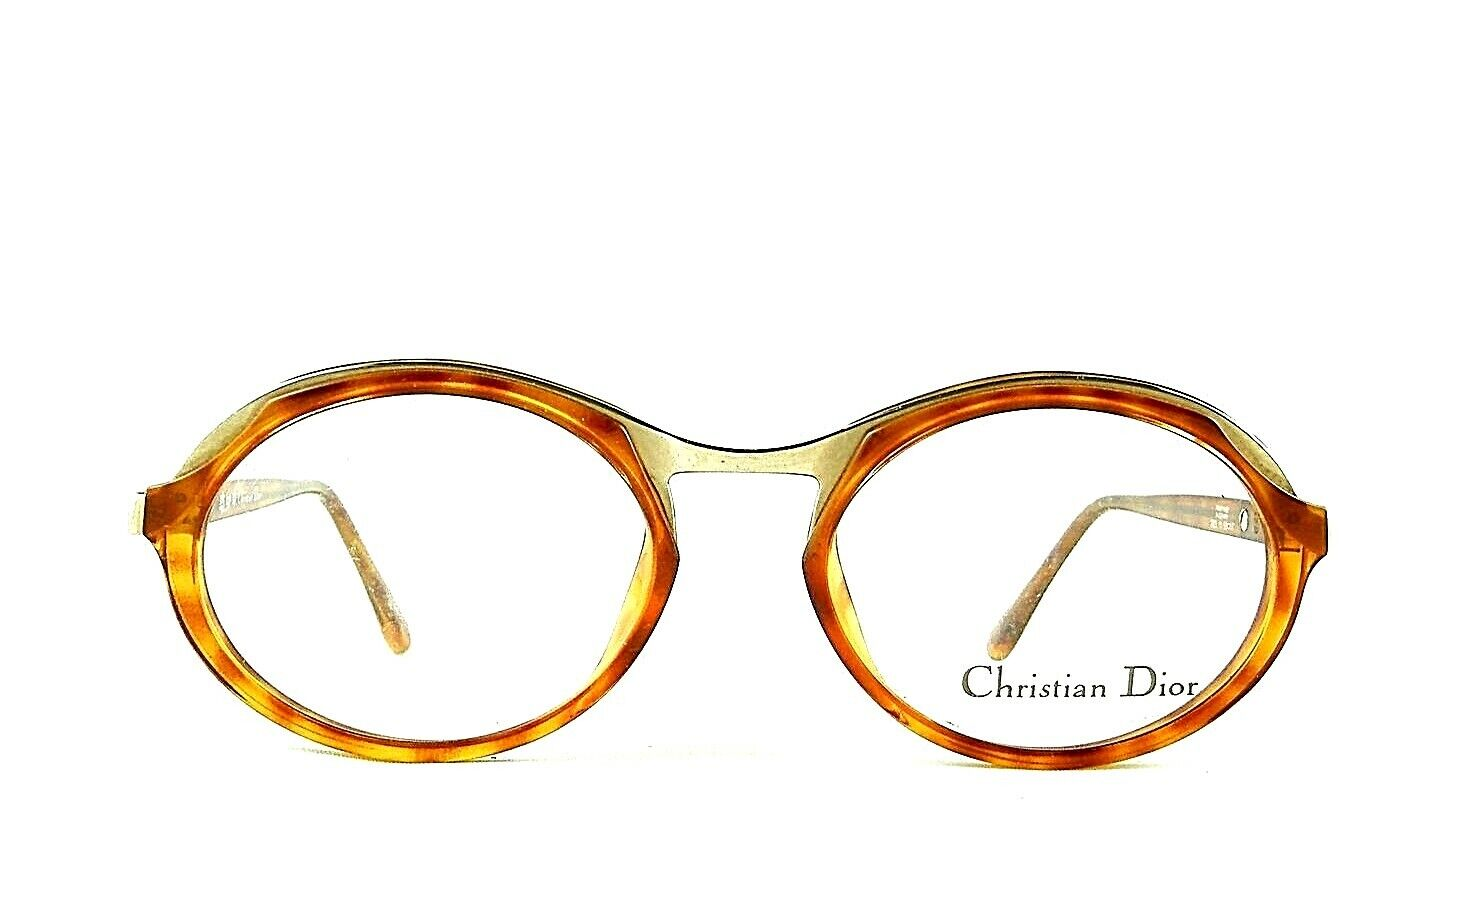 Christian Dior Eyeglasses 2623 11 53 17 130 VINTAGE EYEGLASSES NEW!-show original title